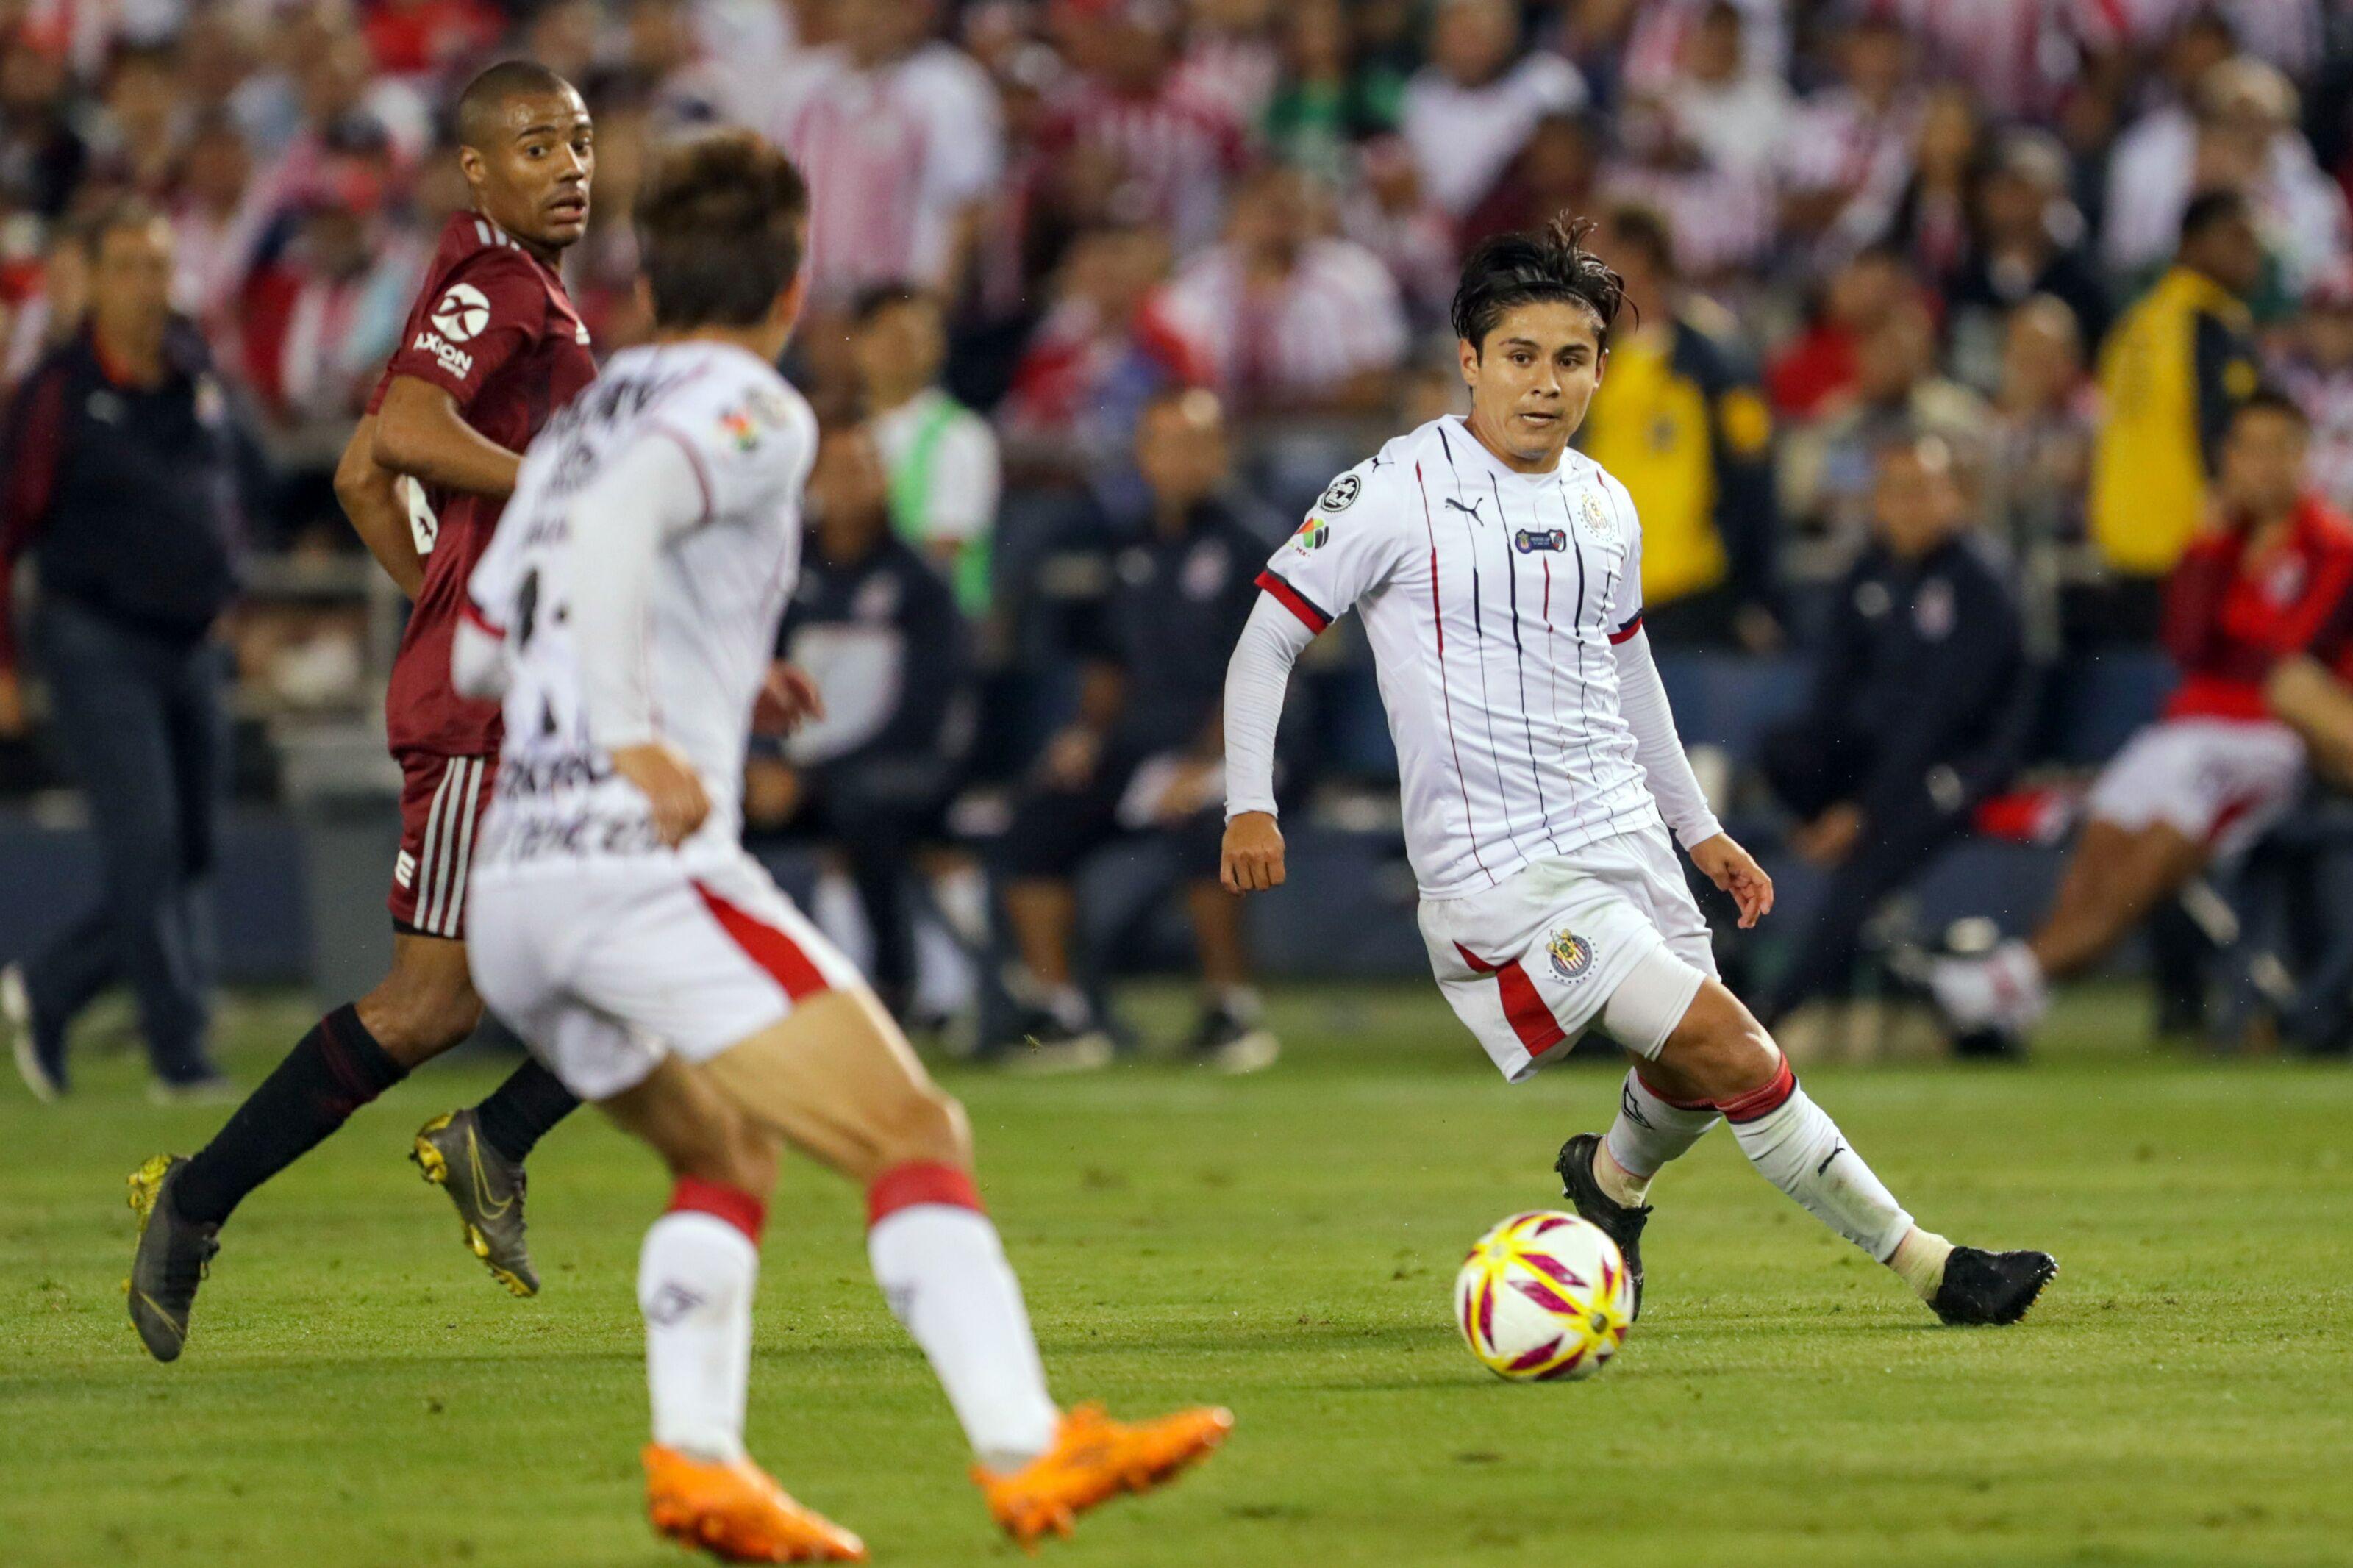 Chivas off to slow start in preseason, despite key acquisitions